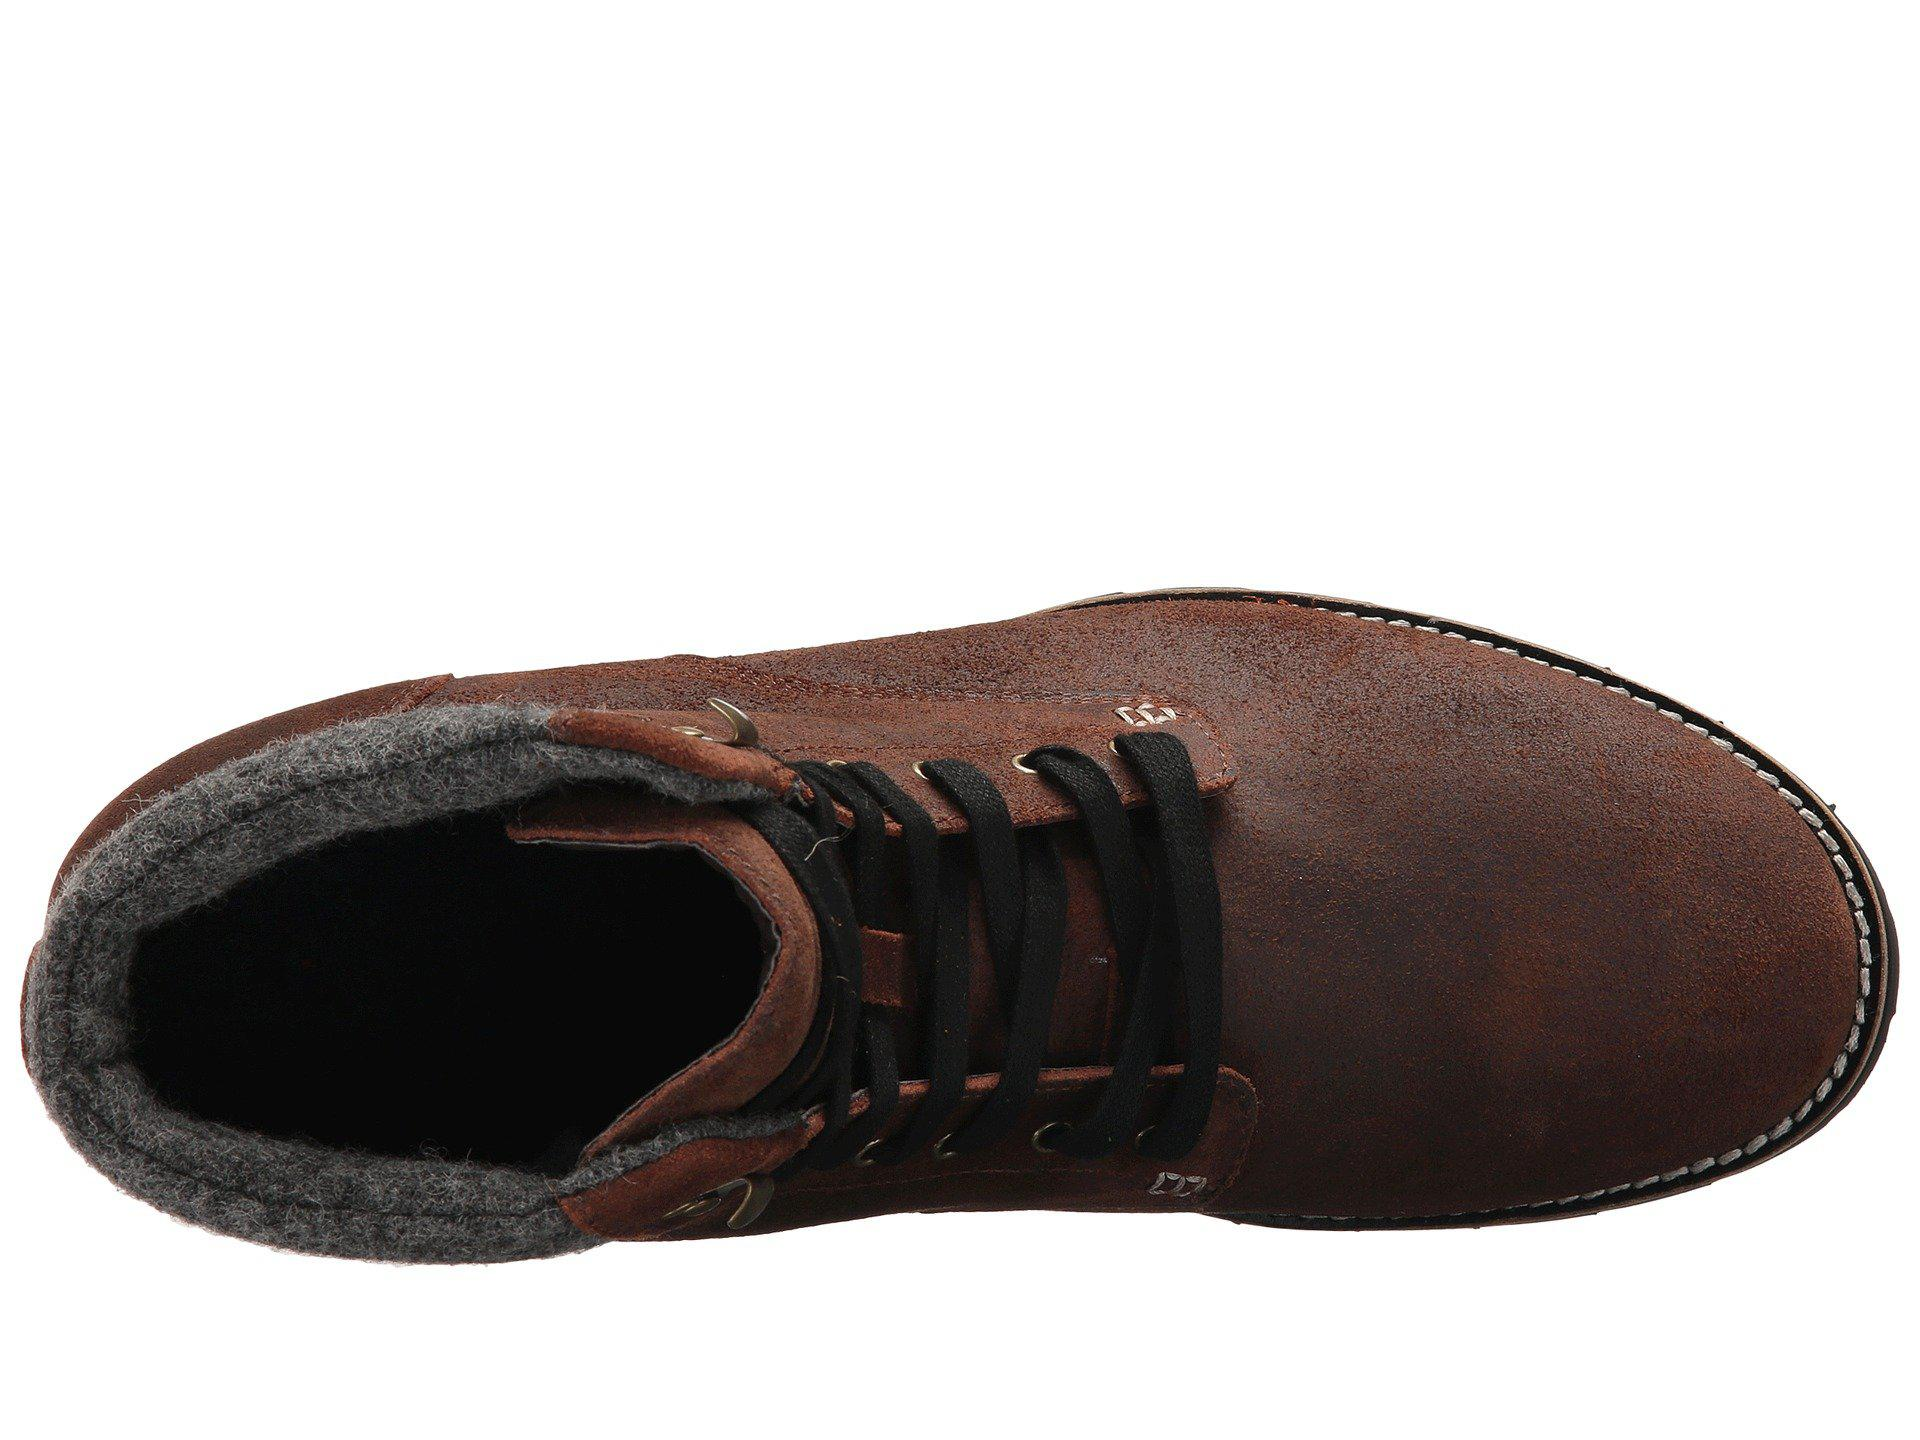 80aa0a56da5 Men's Brown 1830 Explorer